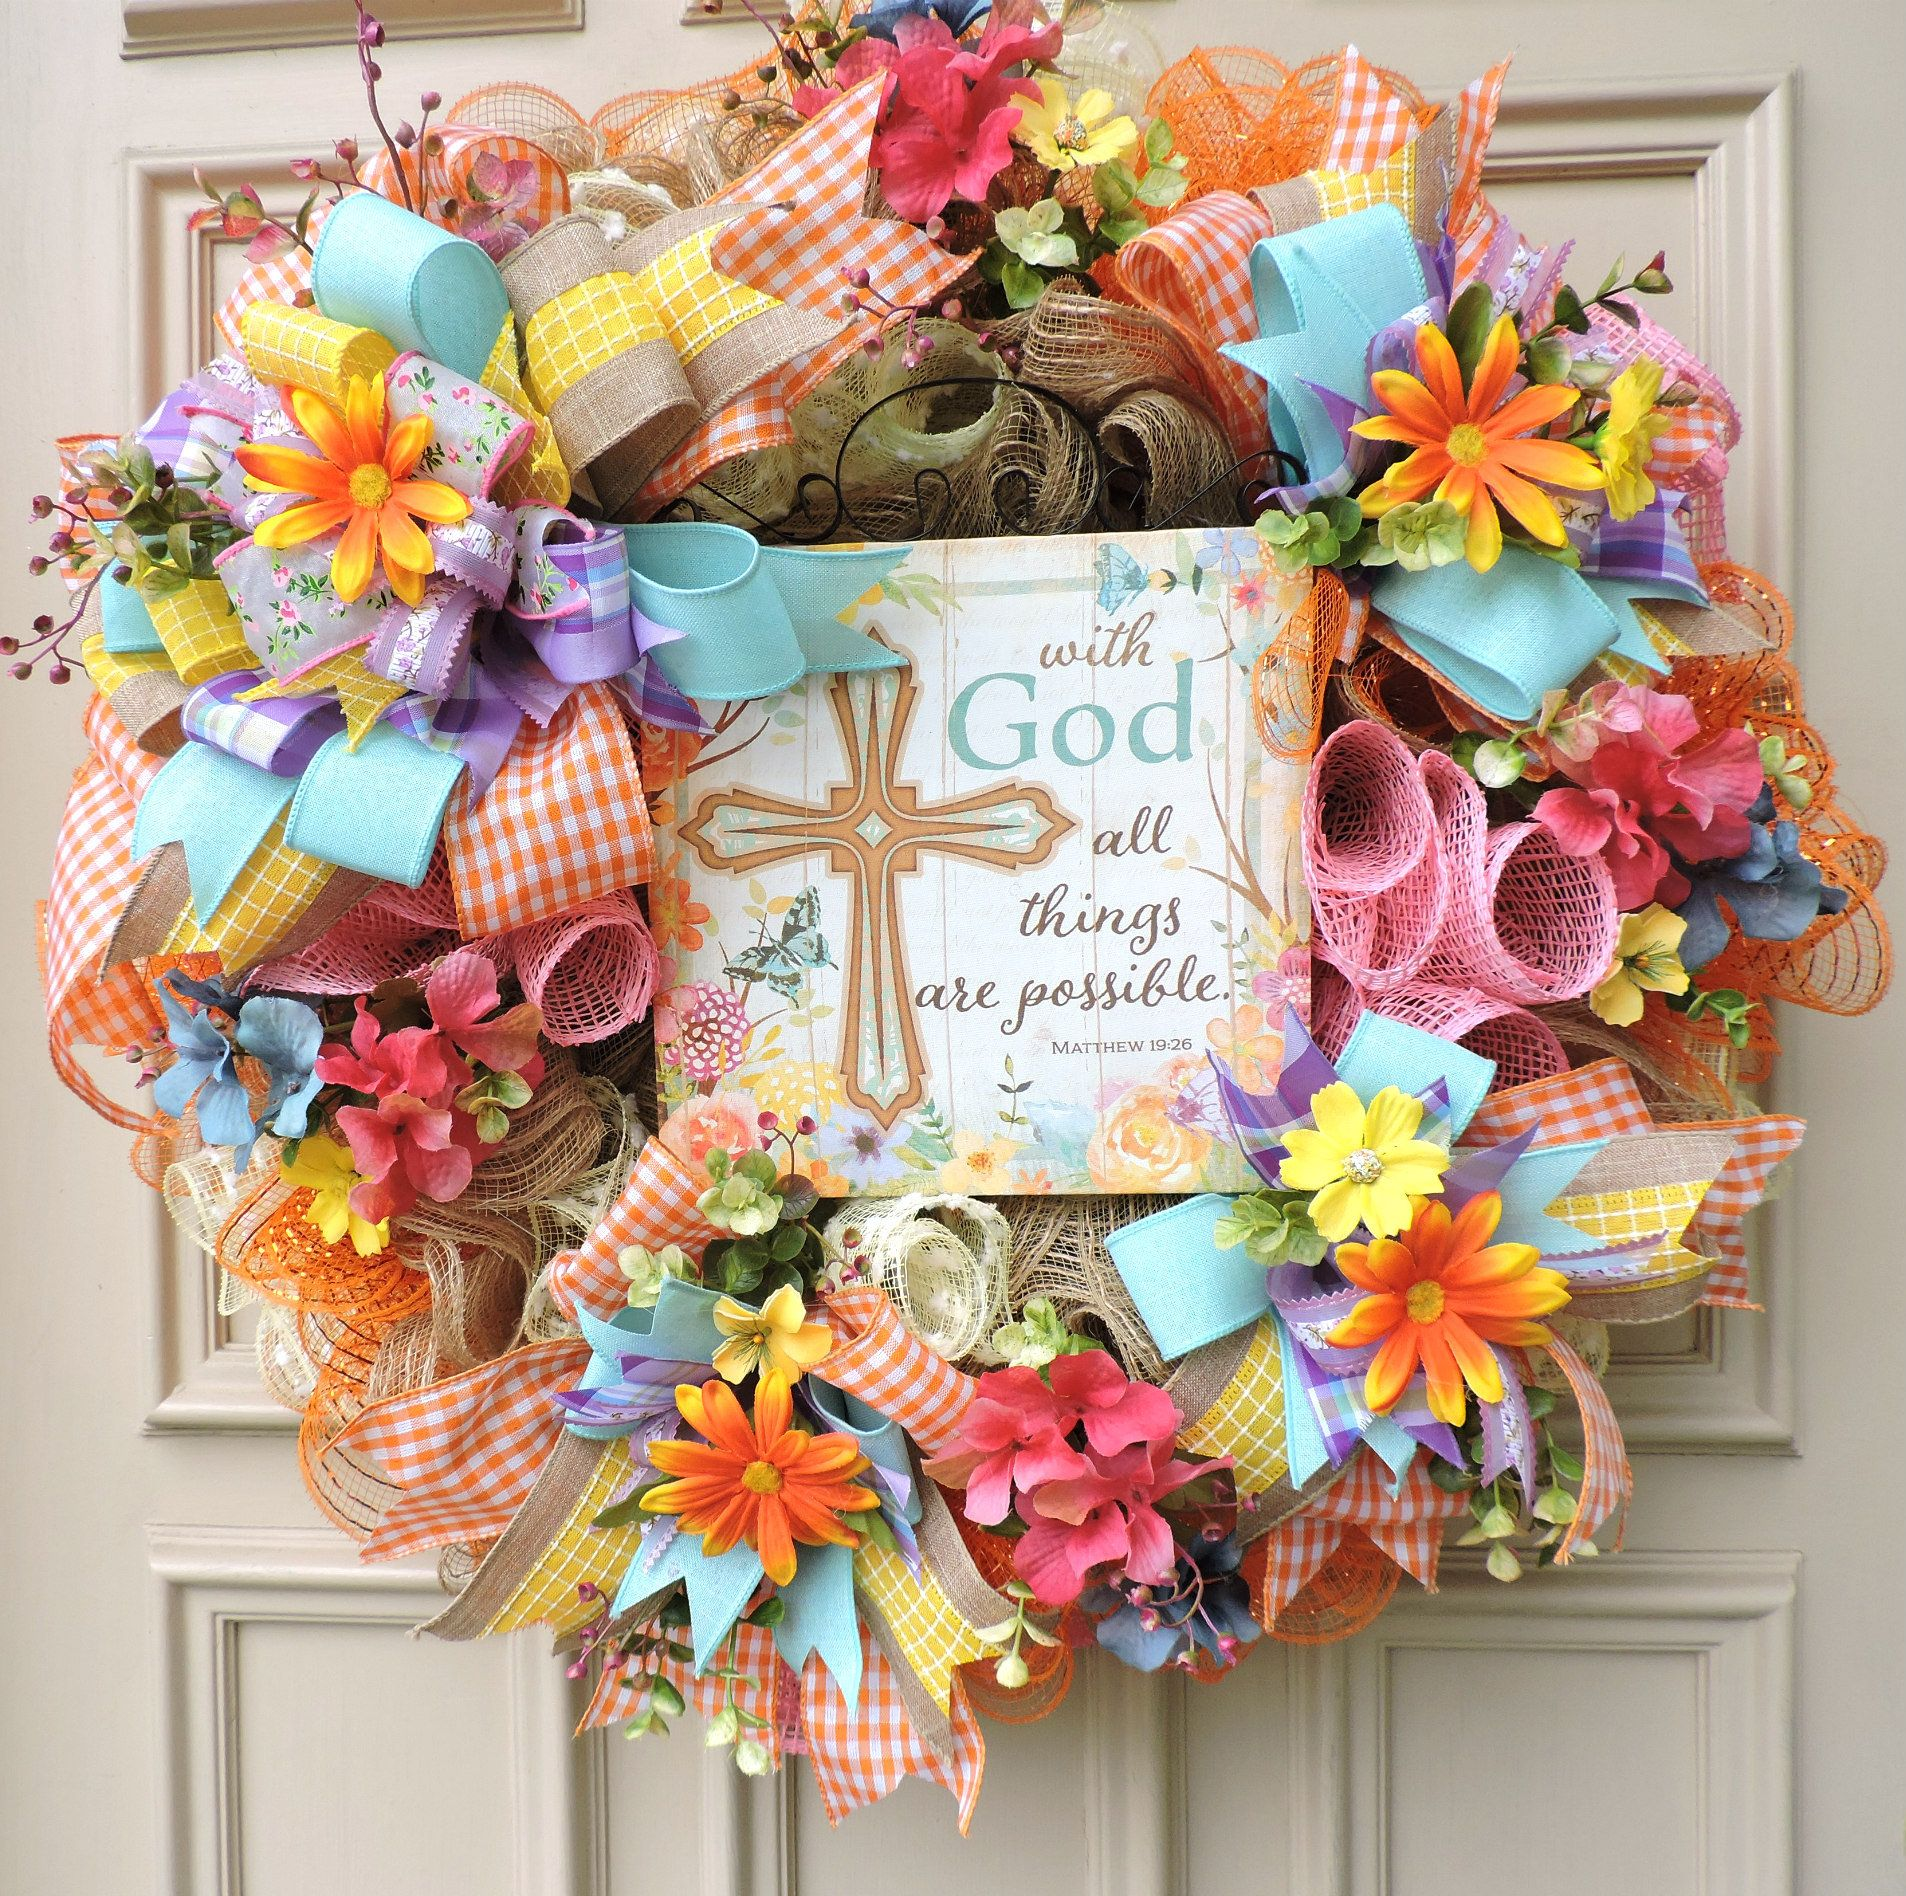 Christmas Faith Nativity Door Hanger Home Decor Winter Wreath Jesus